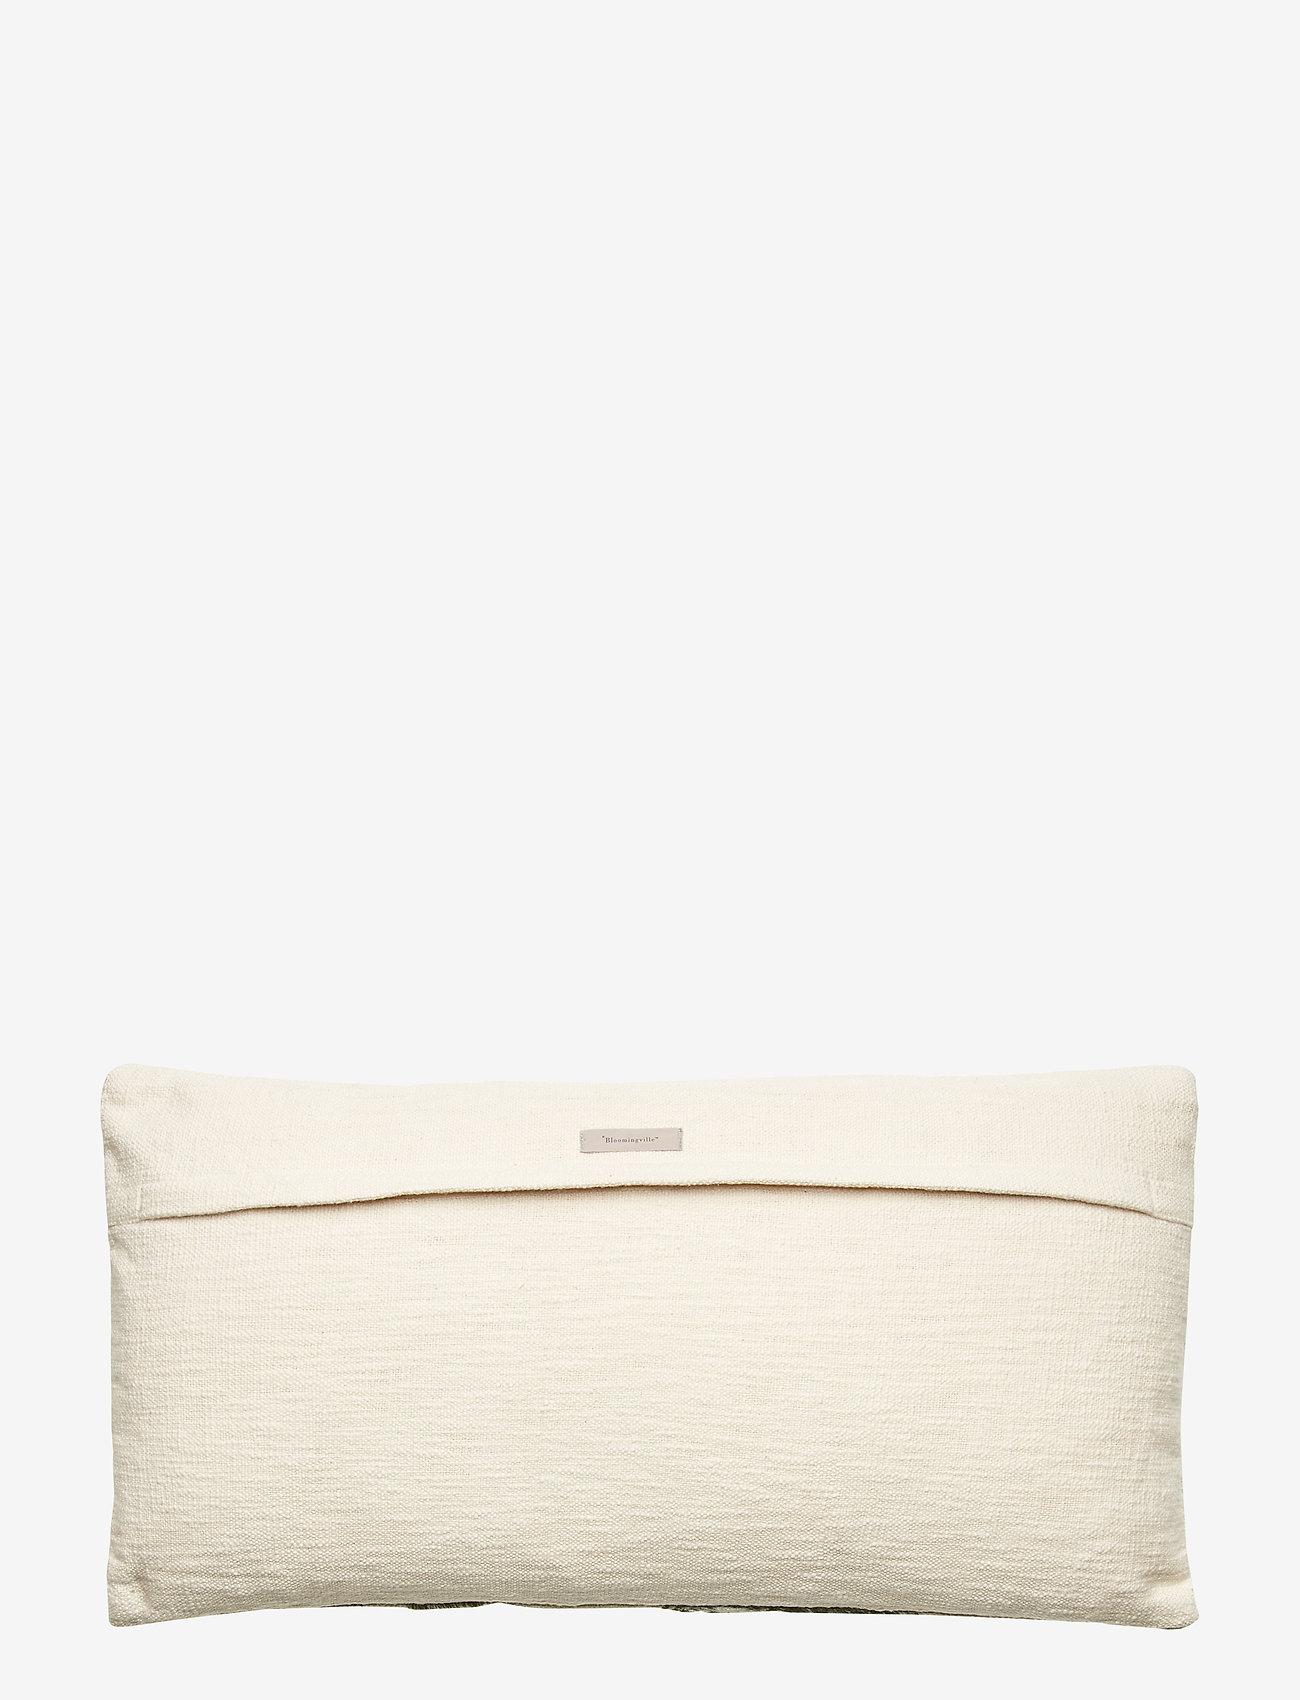 Cushion (Multi) (359.20 kr) - Bloomingville 5FdZMcnL